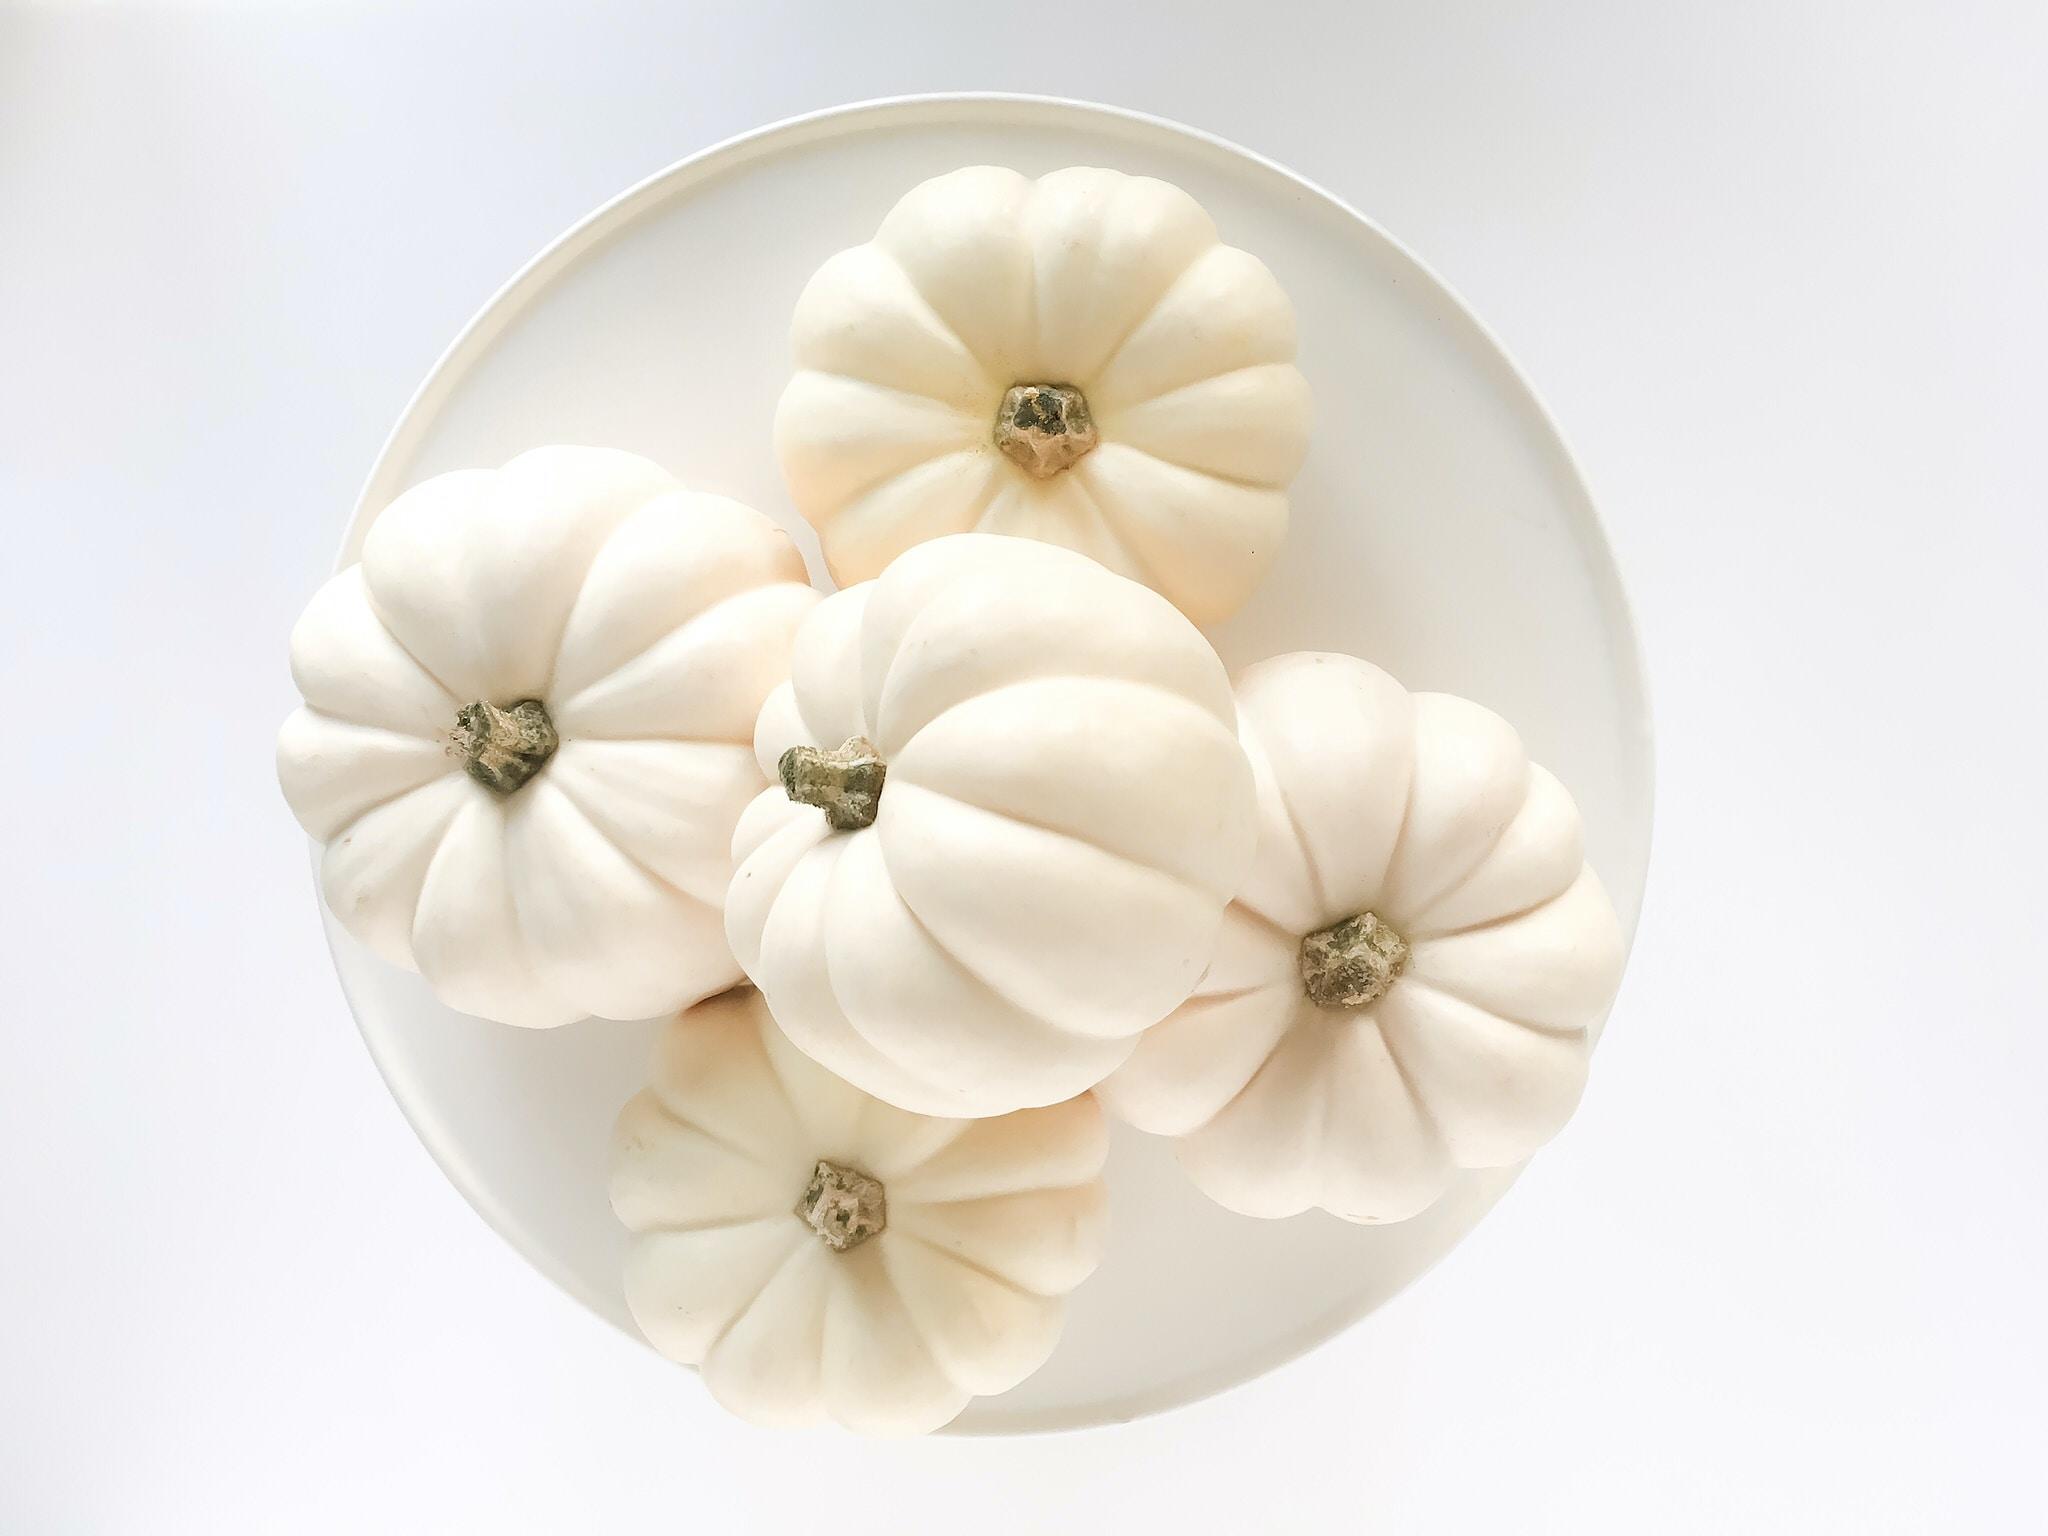 five white garlics